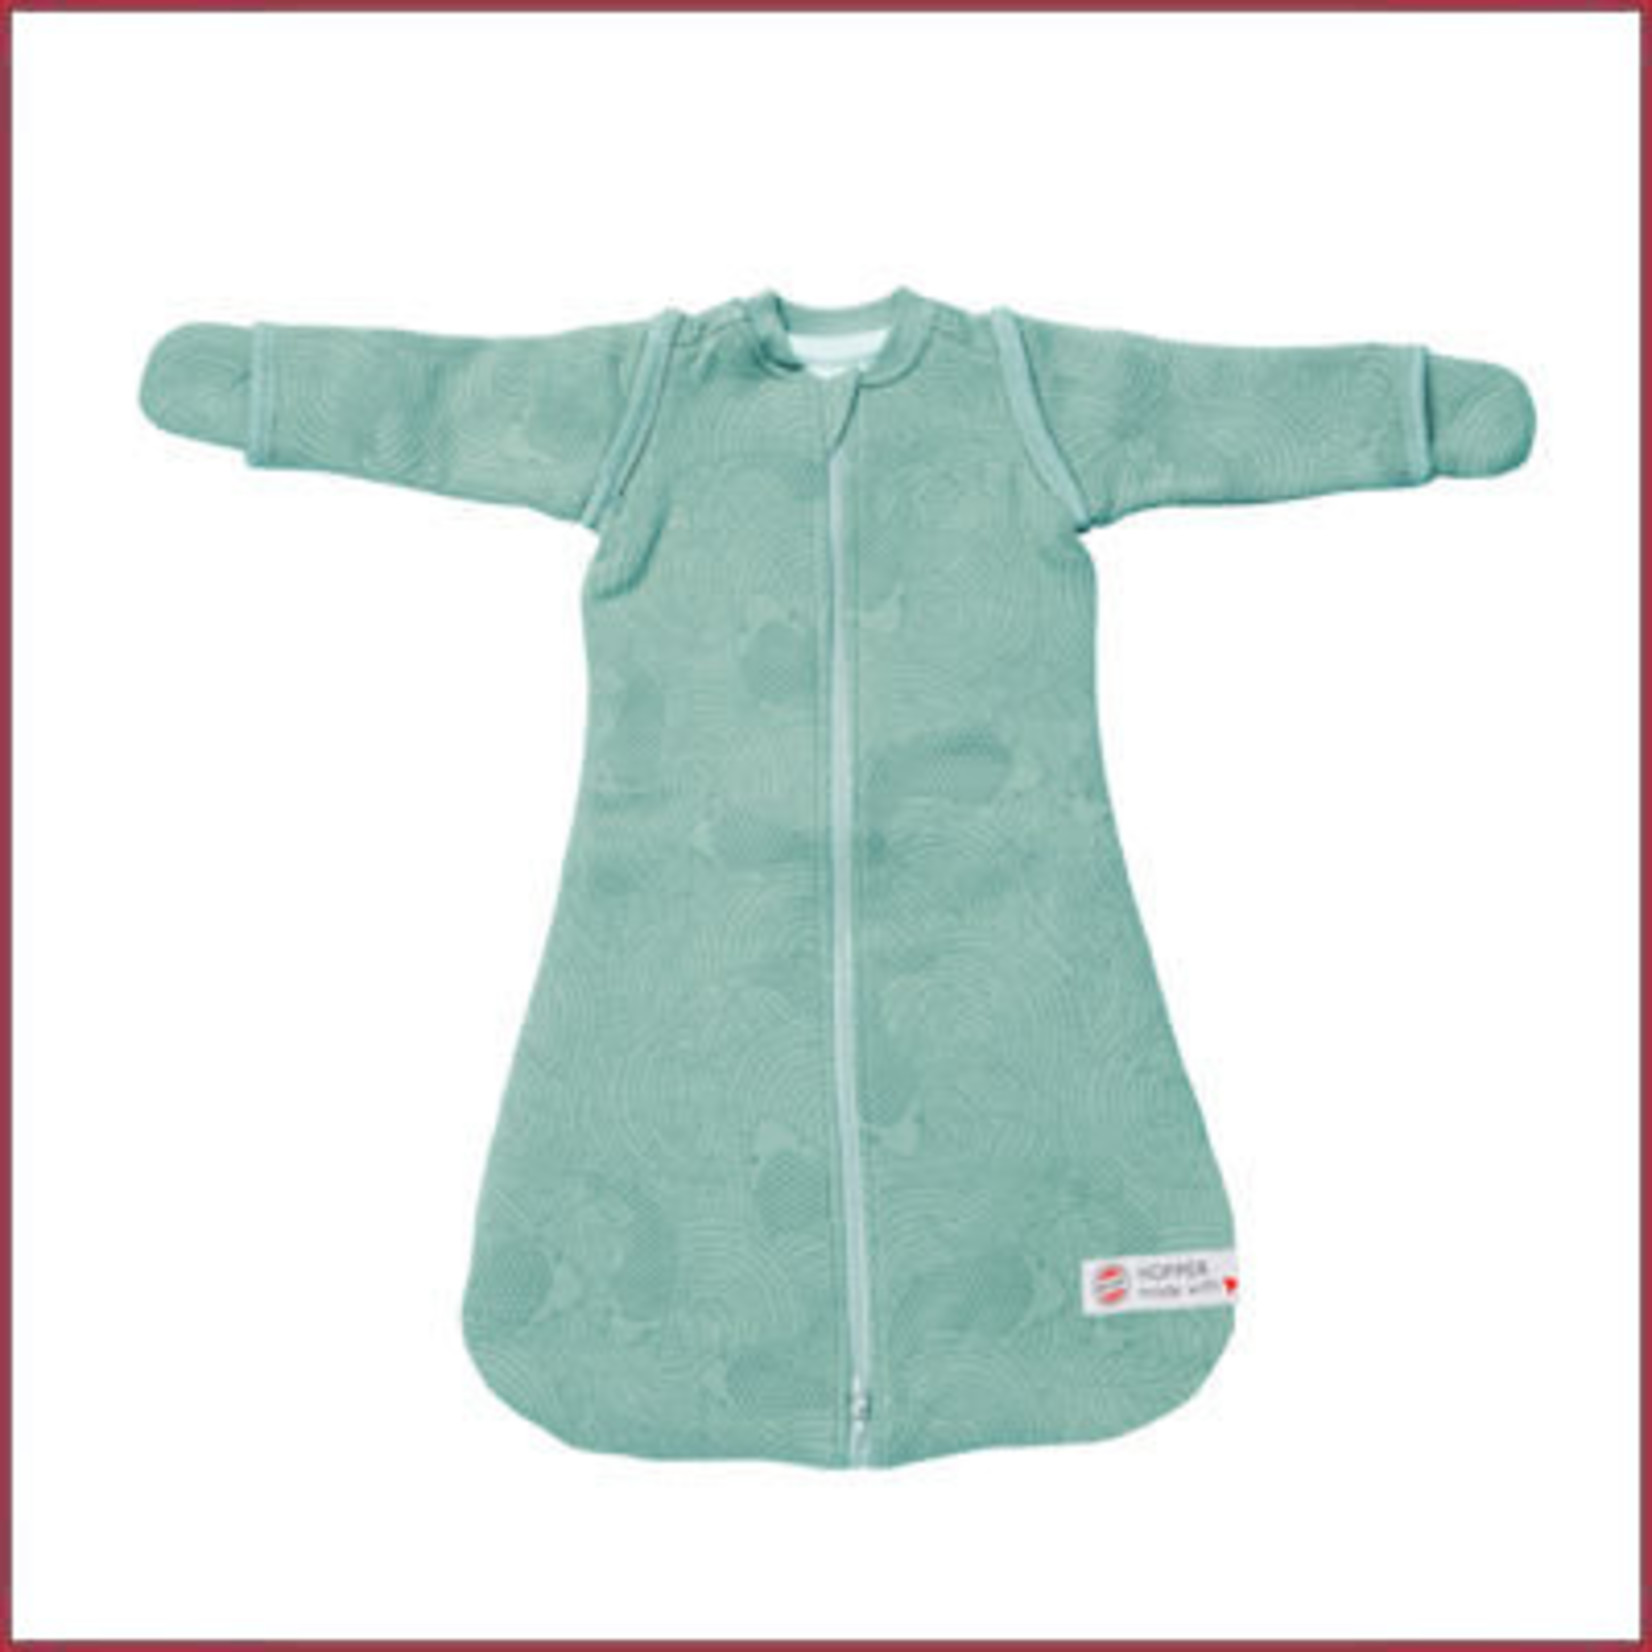 Lodger Hopper Baby Slaapzak met mouwen Empire Silt green